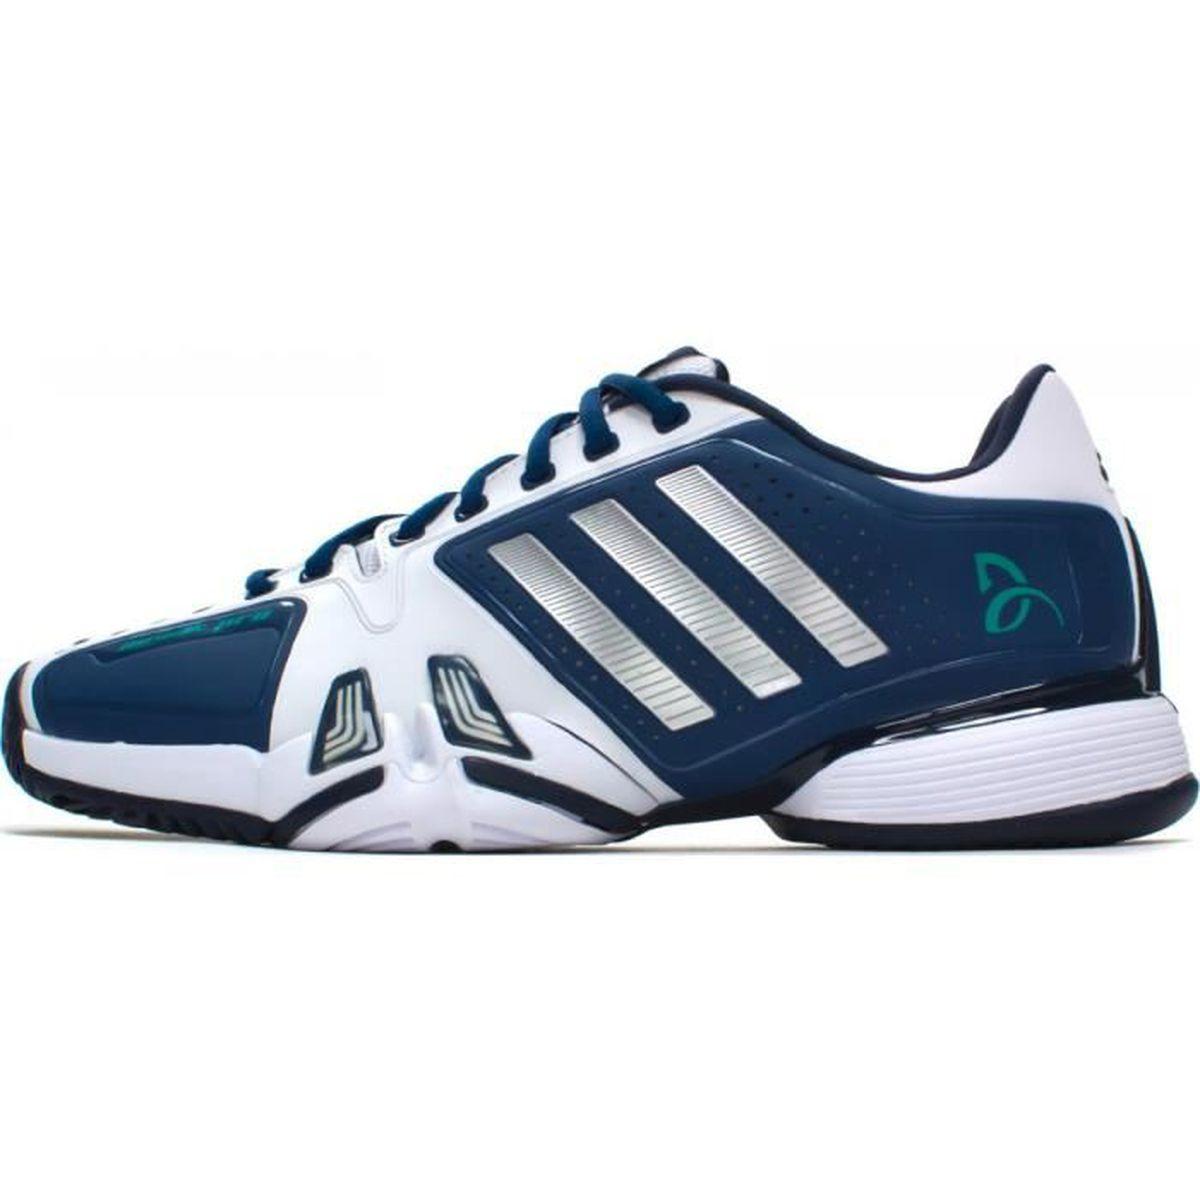 Chaussures de tennis Adidas Novak Pro Prix pas cher